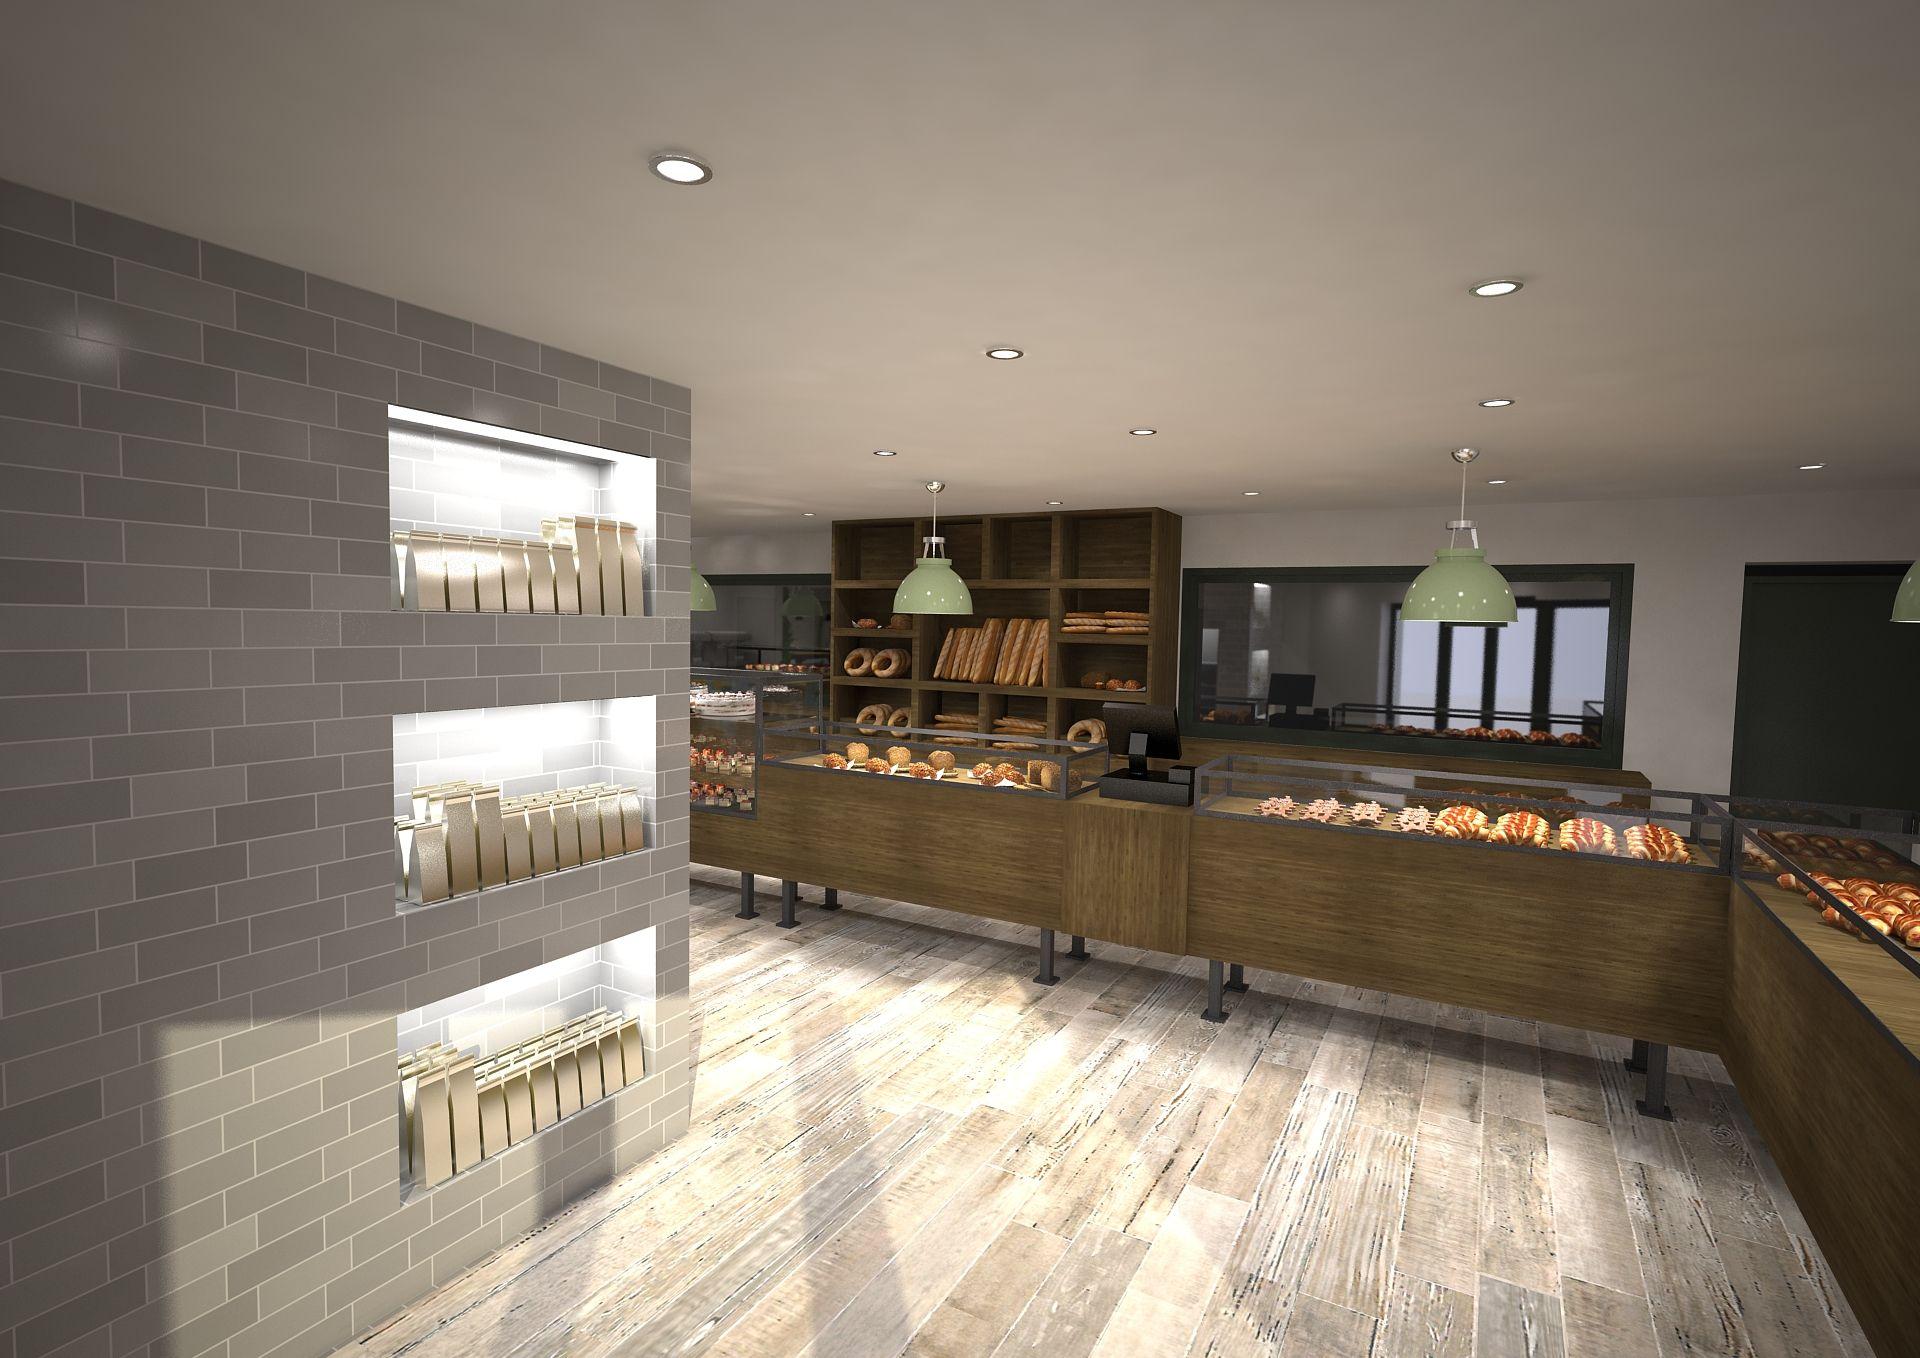 agencement commerce boulangerie p tisserie caf grenoble 38 r alis par. Black Bedroom Furniture Sets. Home Design Ideas